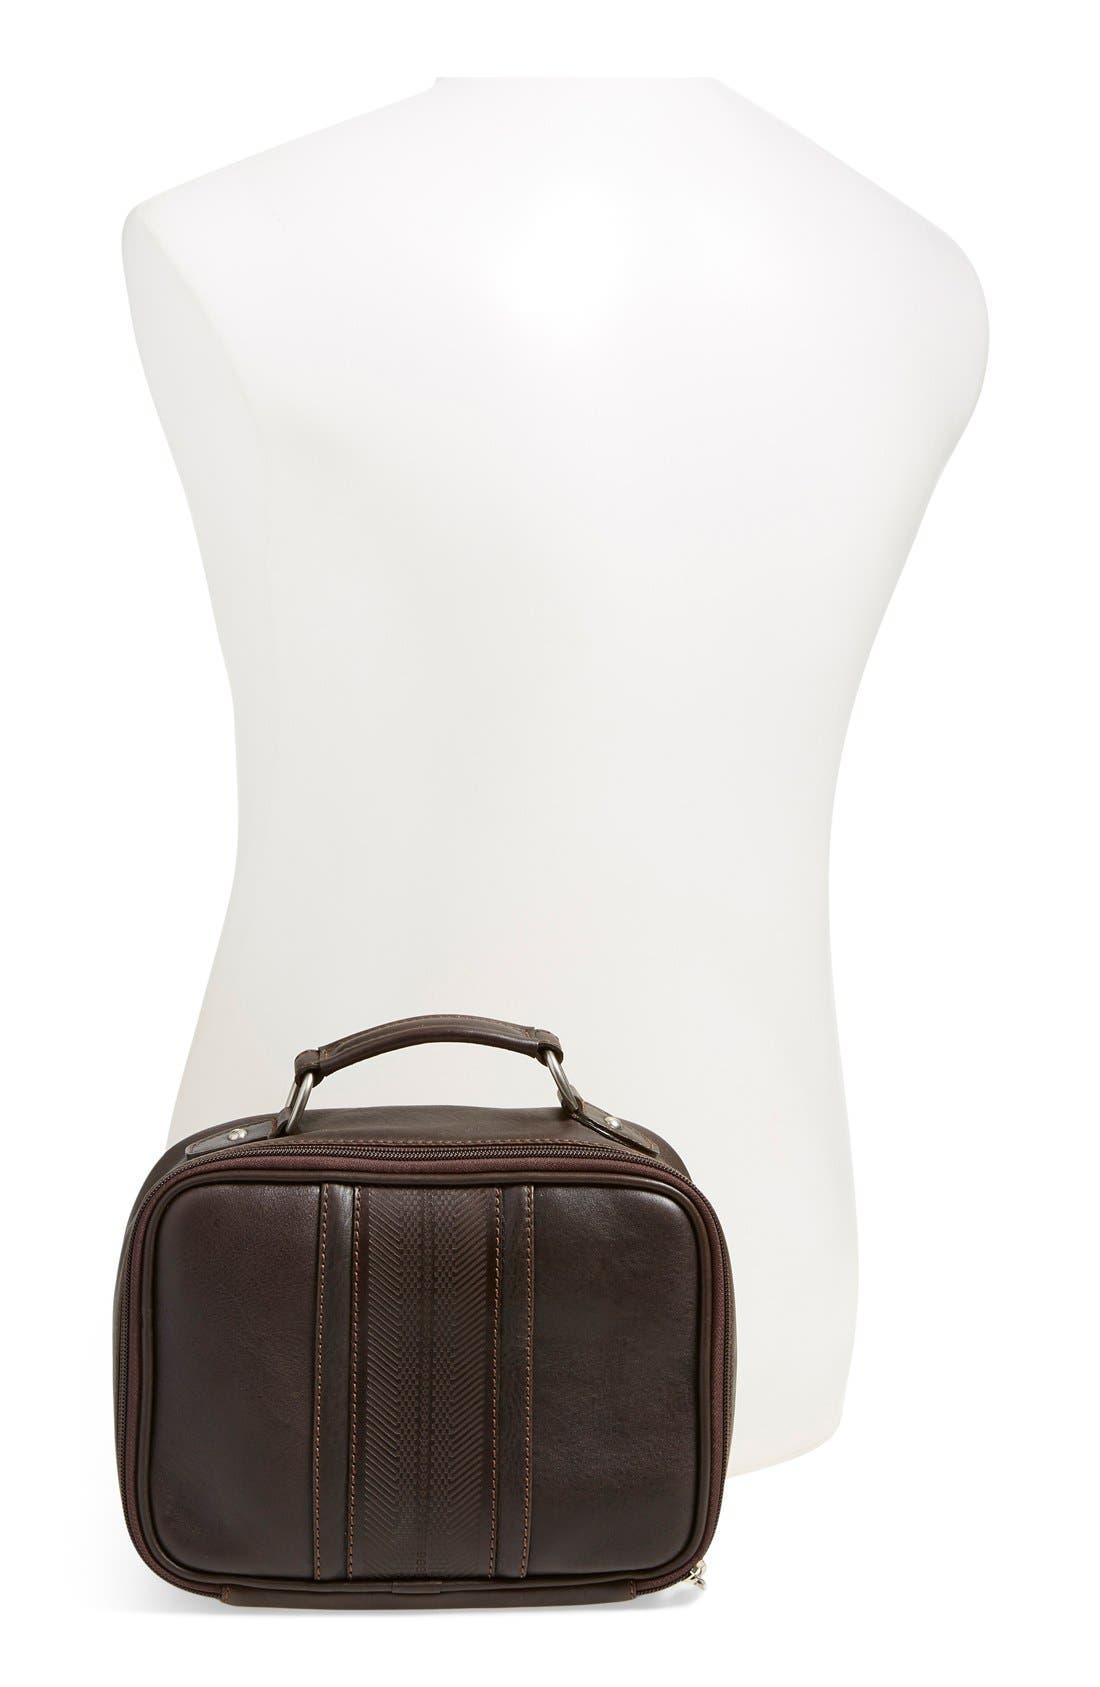 MartinDingman'Rudyard' Leather Travel Kit,                             Alternate thumbnail 2, color,                             CHOCOLATE